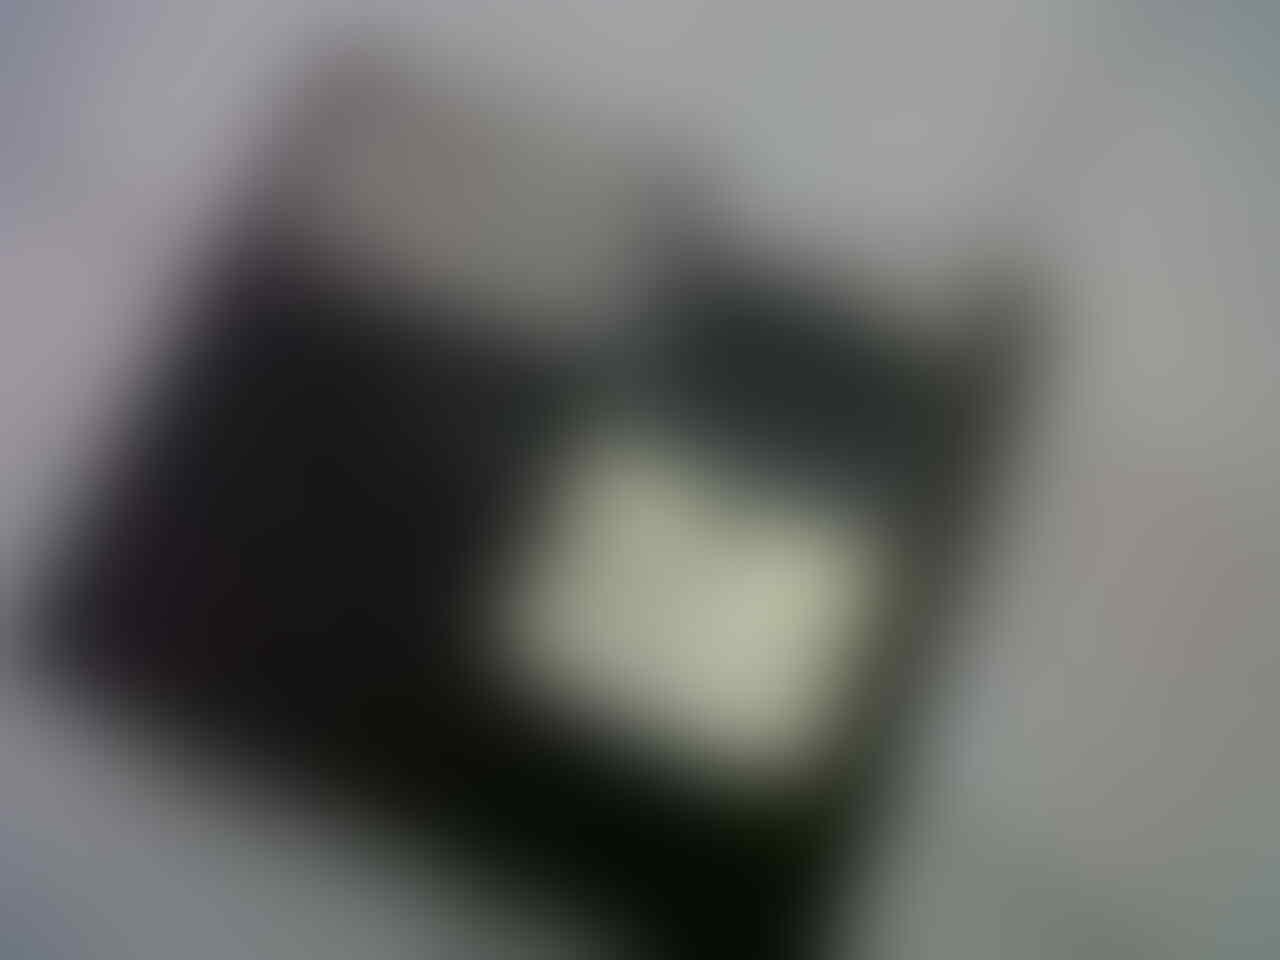 Blackberry Onyx 9700 White SS Fulset Jogjakarta